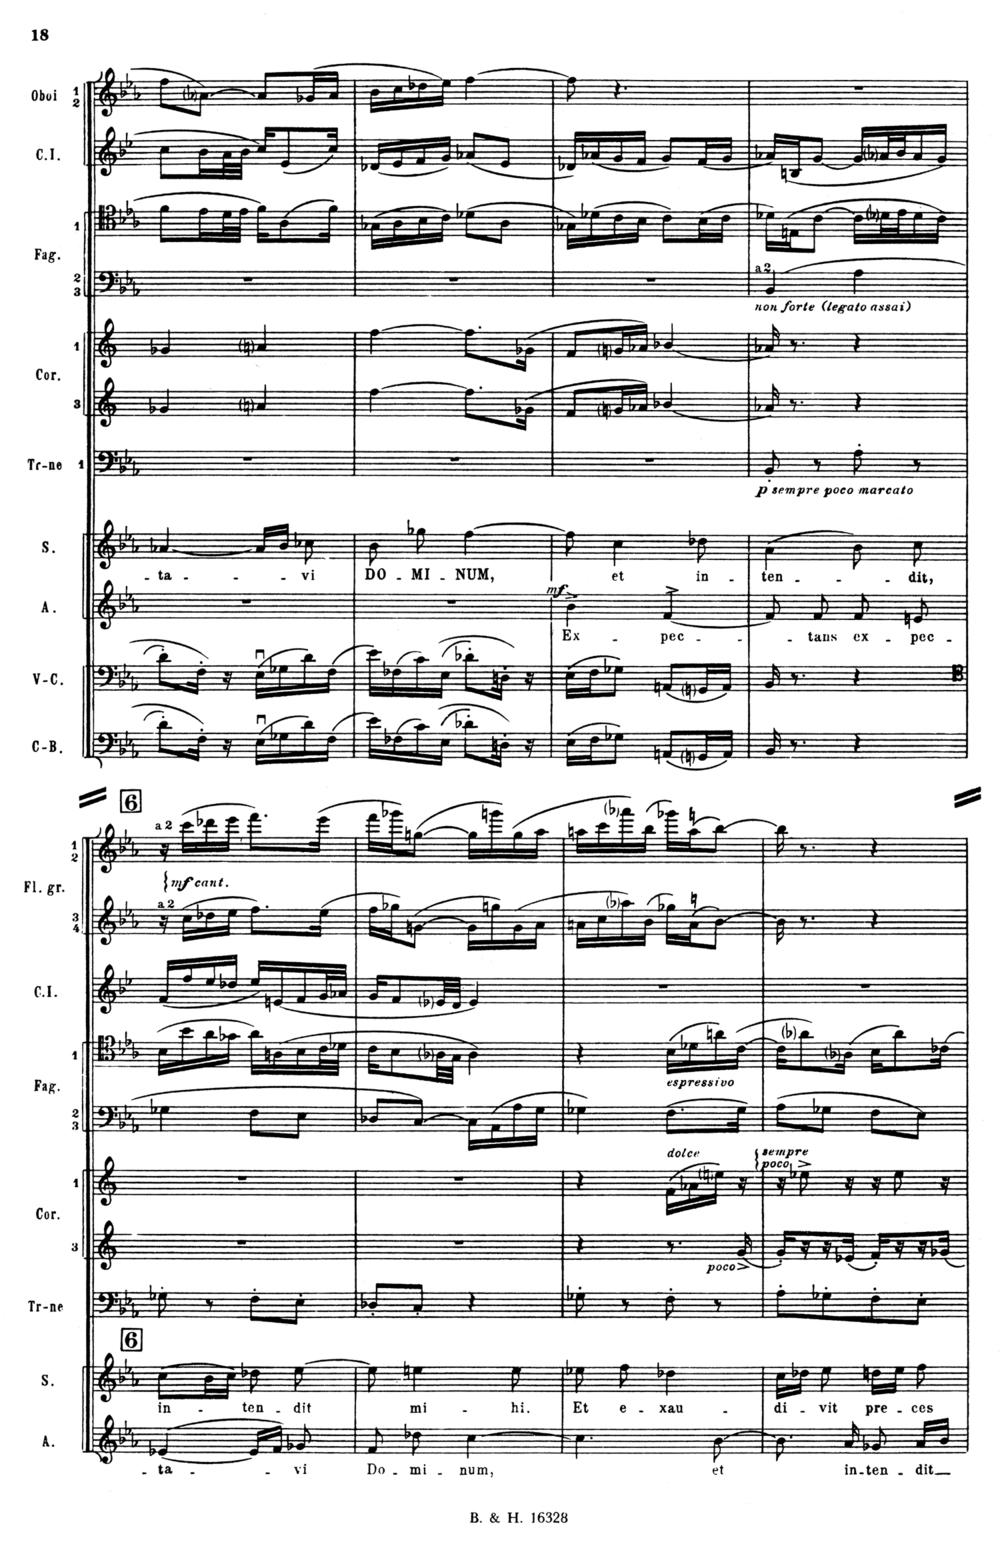 Stravinsky Psalms Score 5.jpg